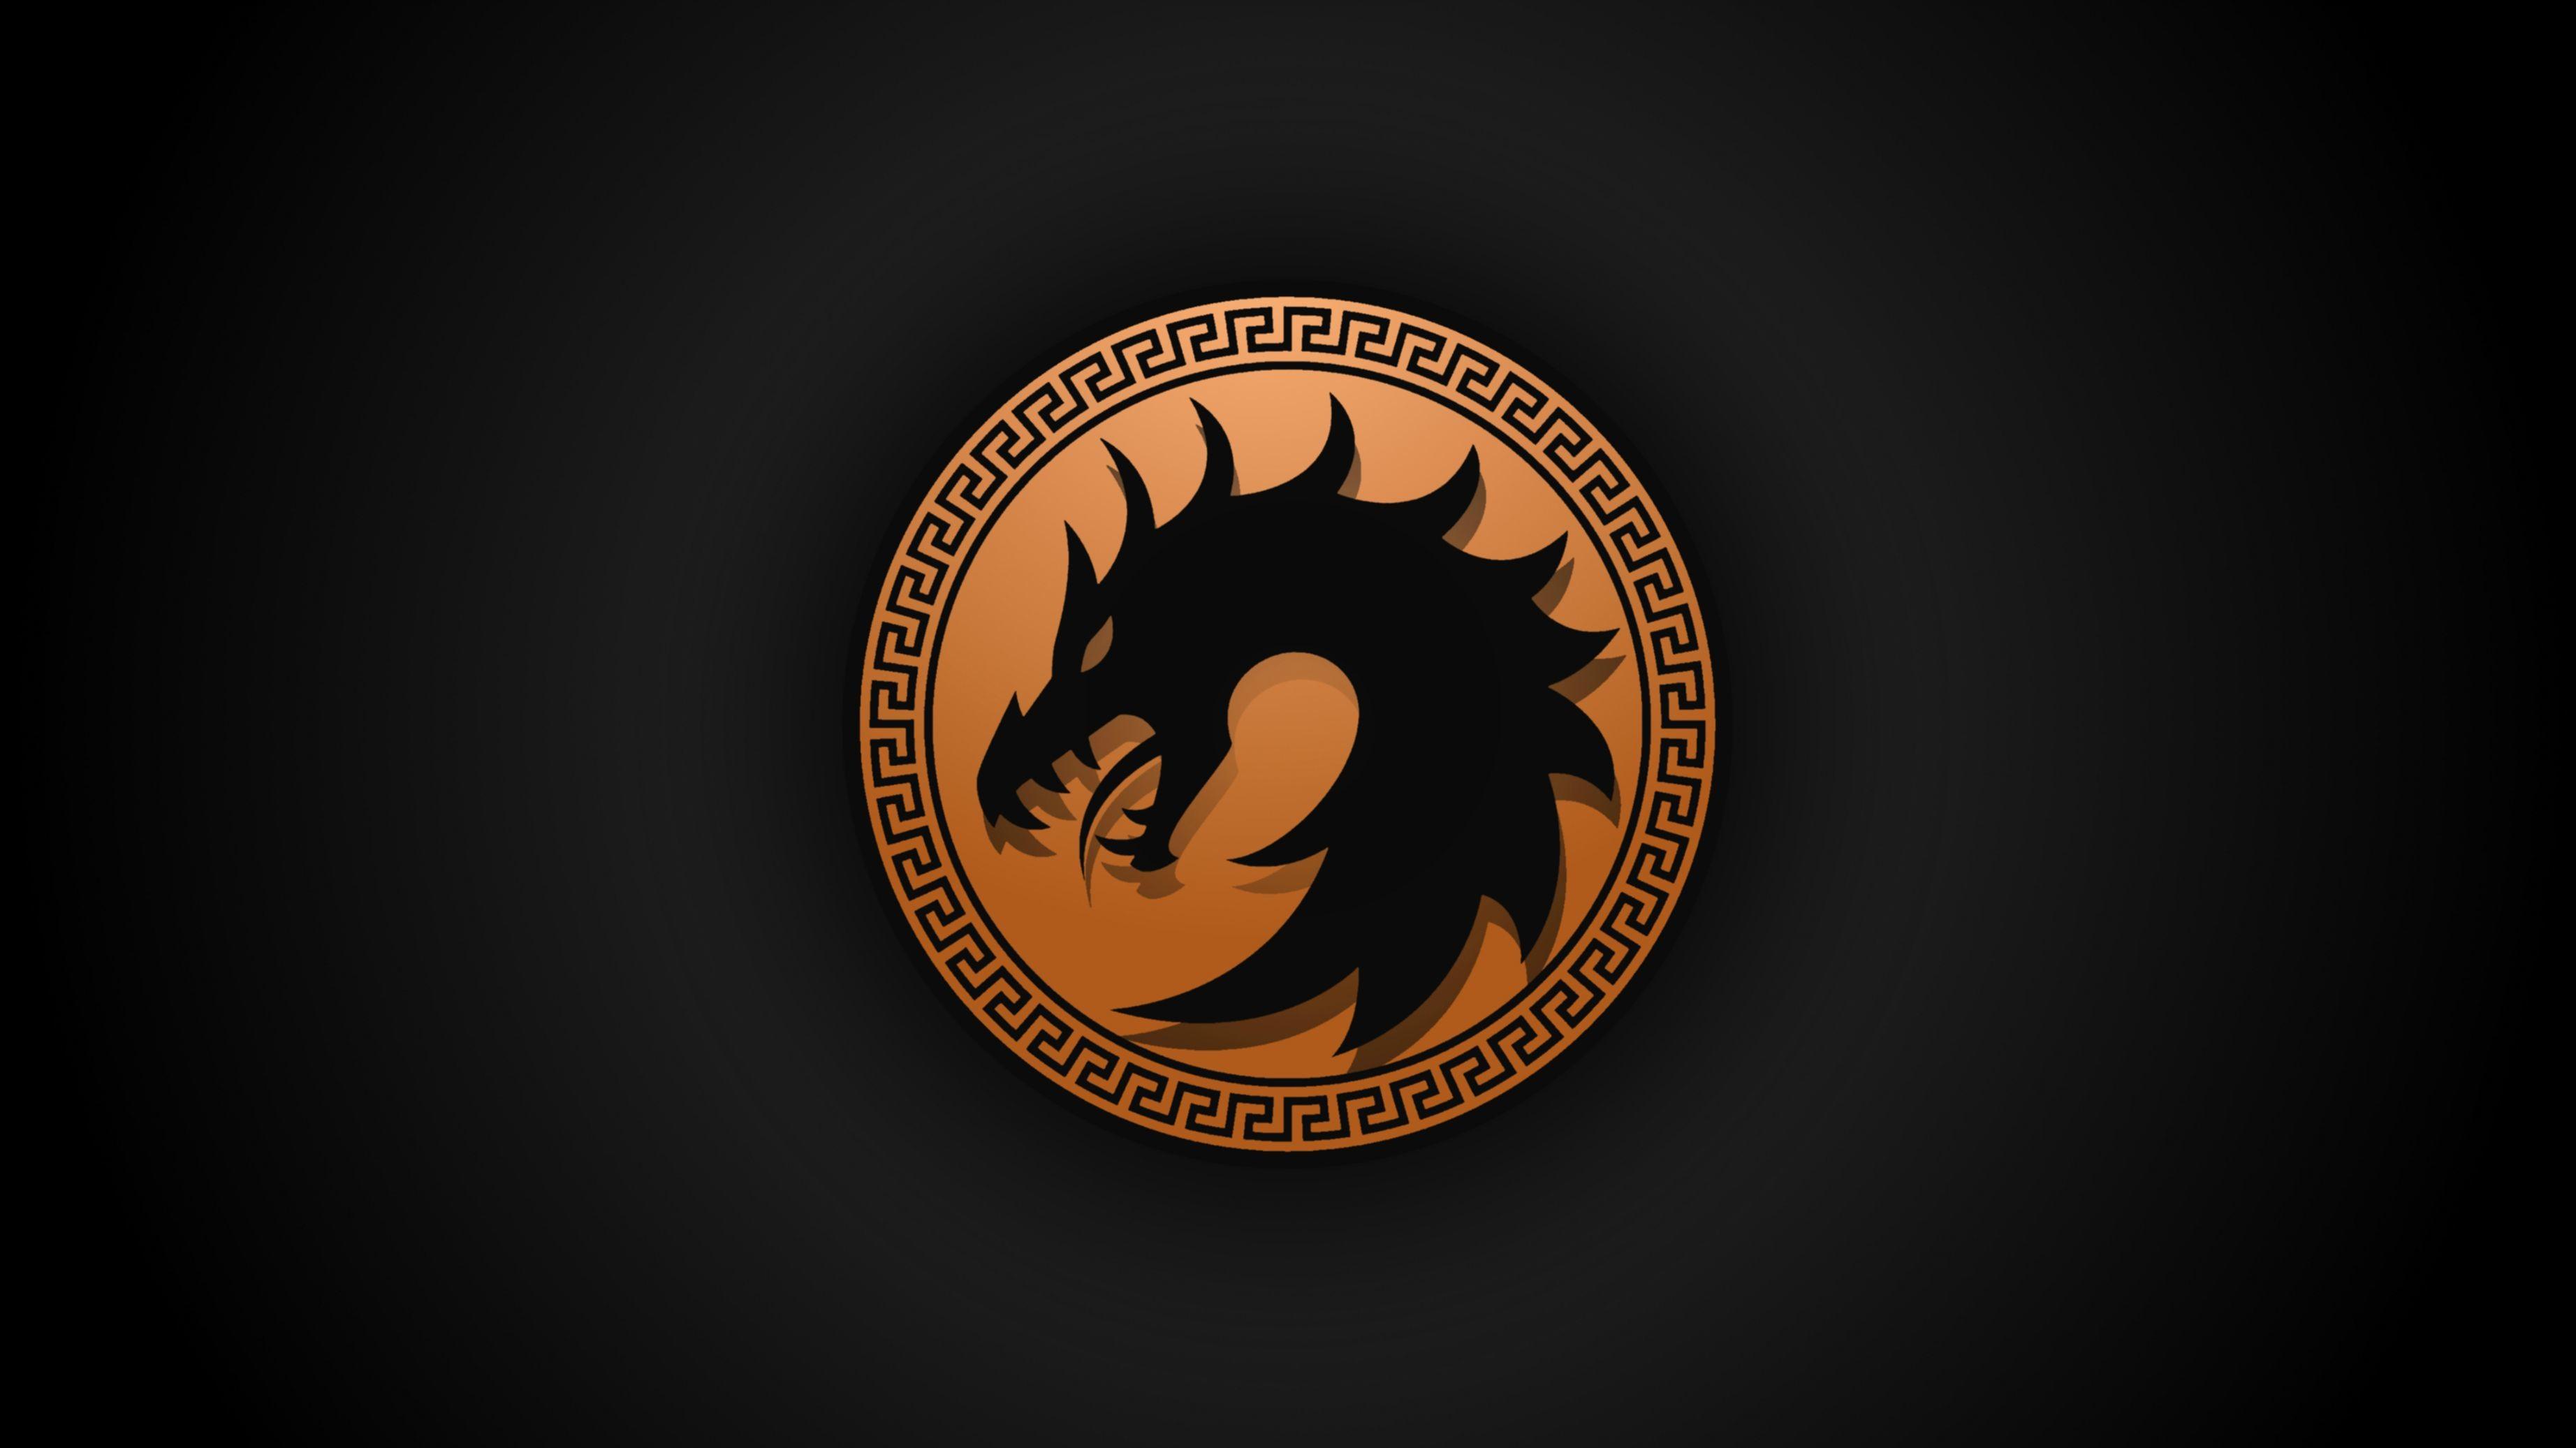 Dragon Logo Wallpaper 71 Pictures